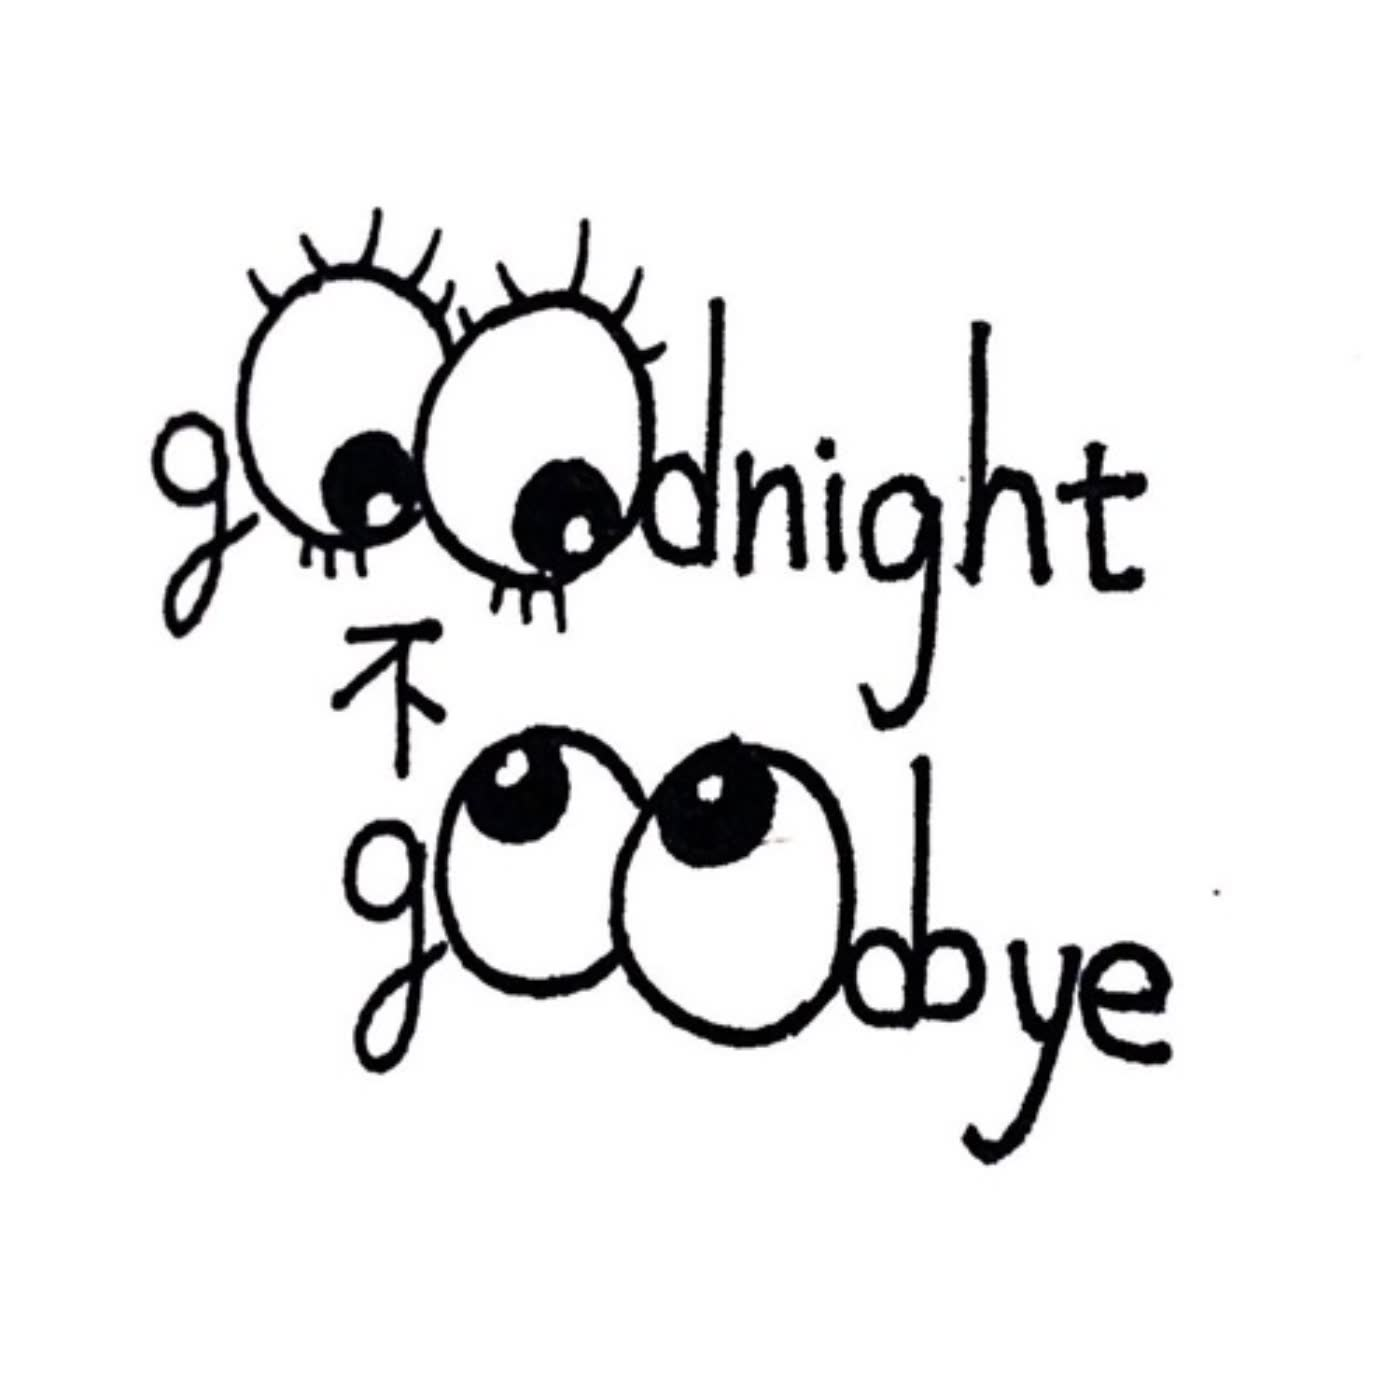 Goodnight不goodbye